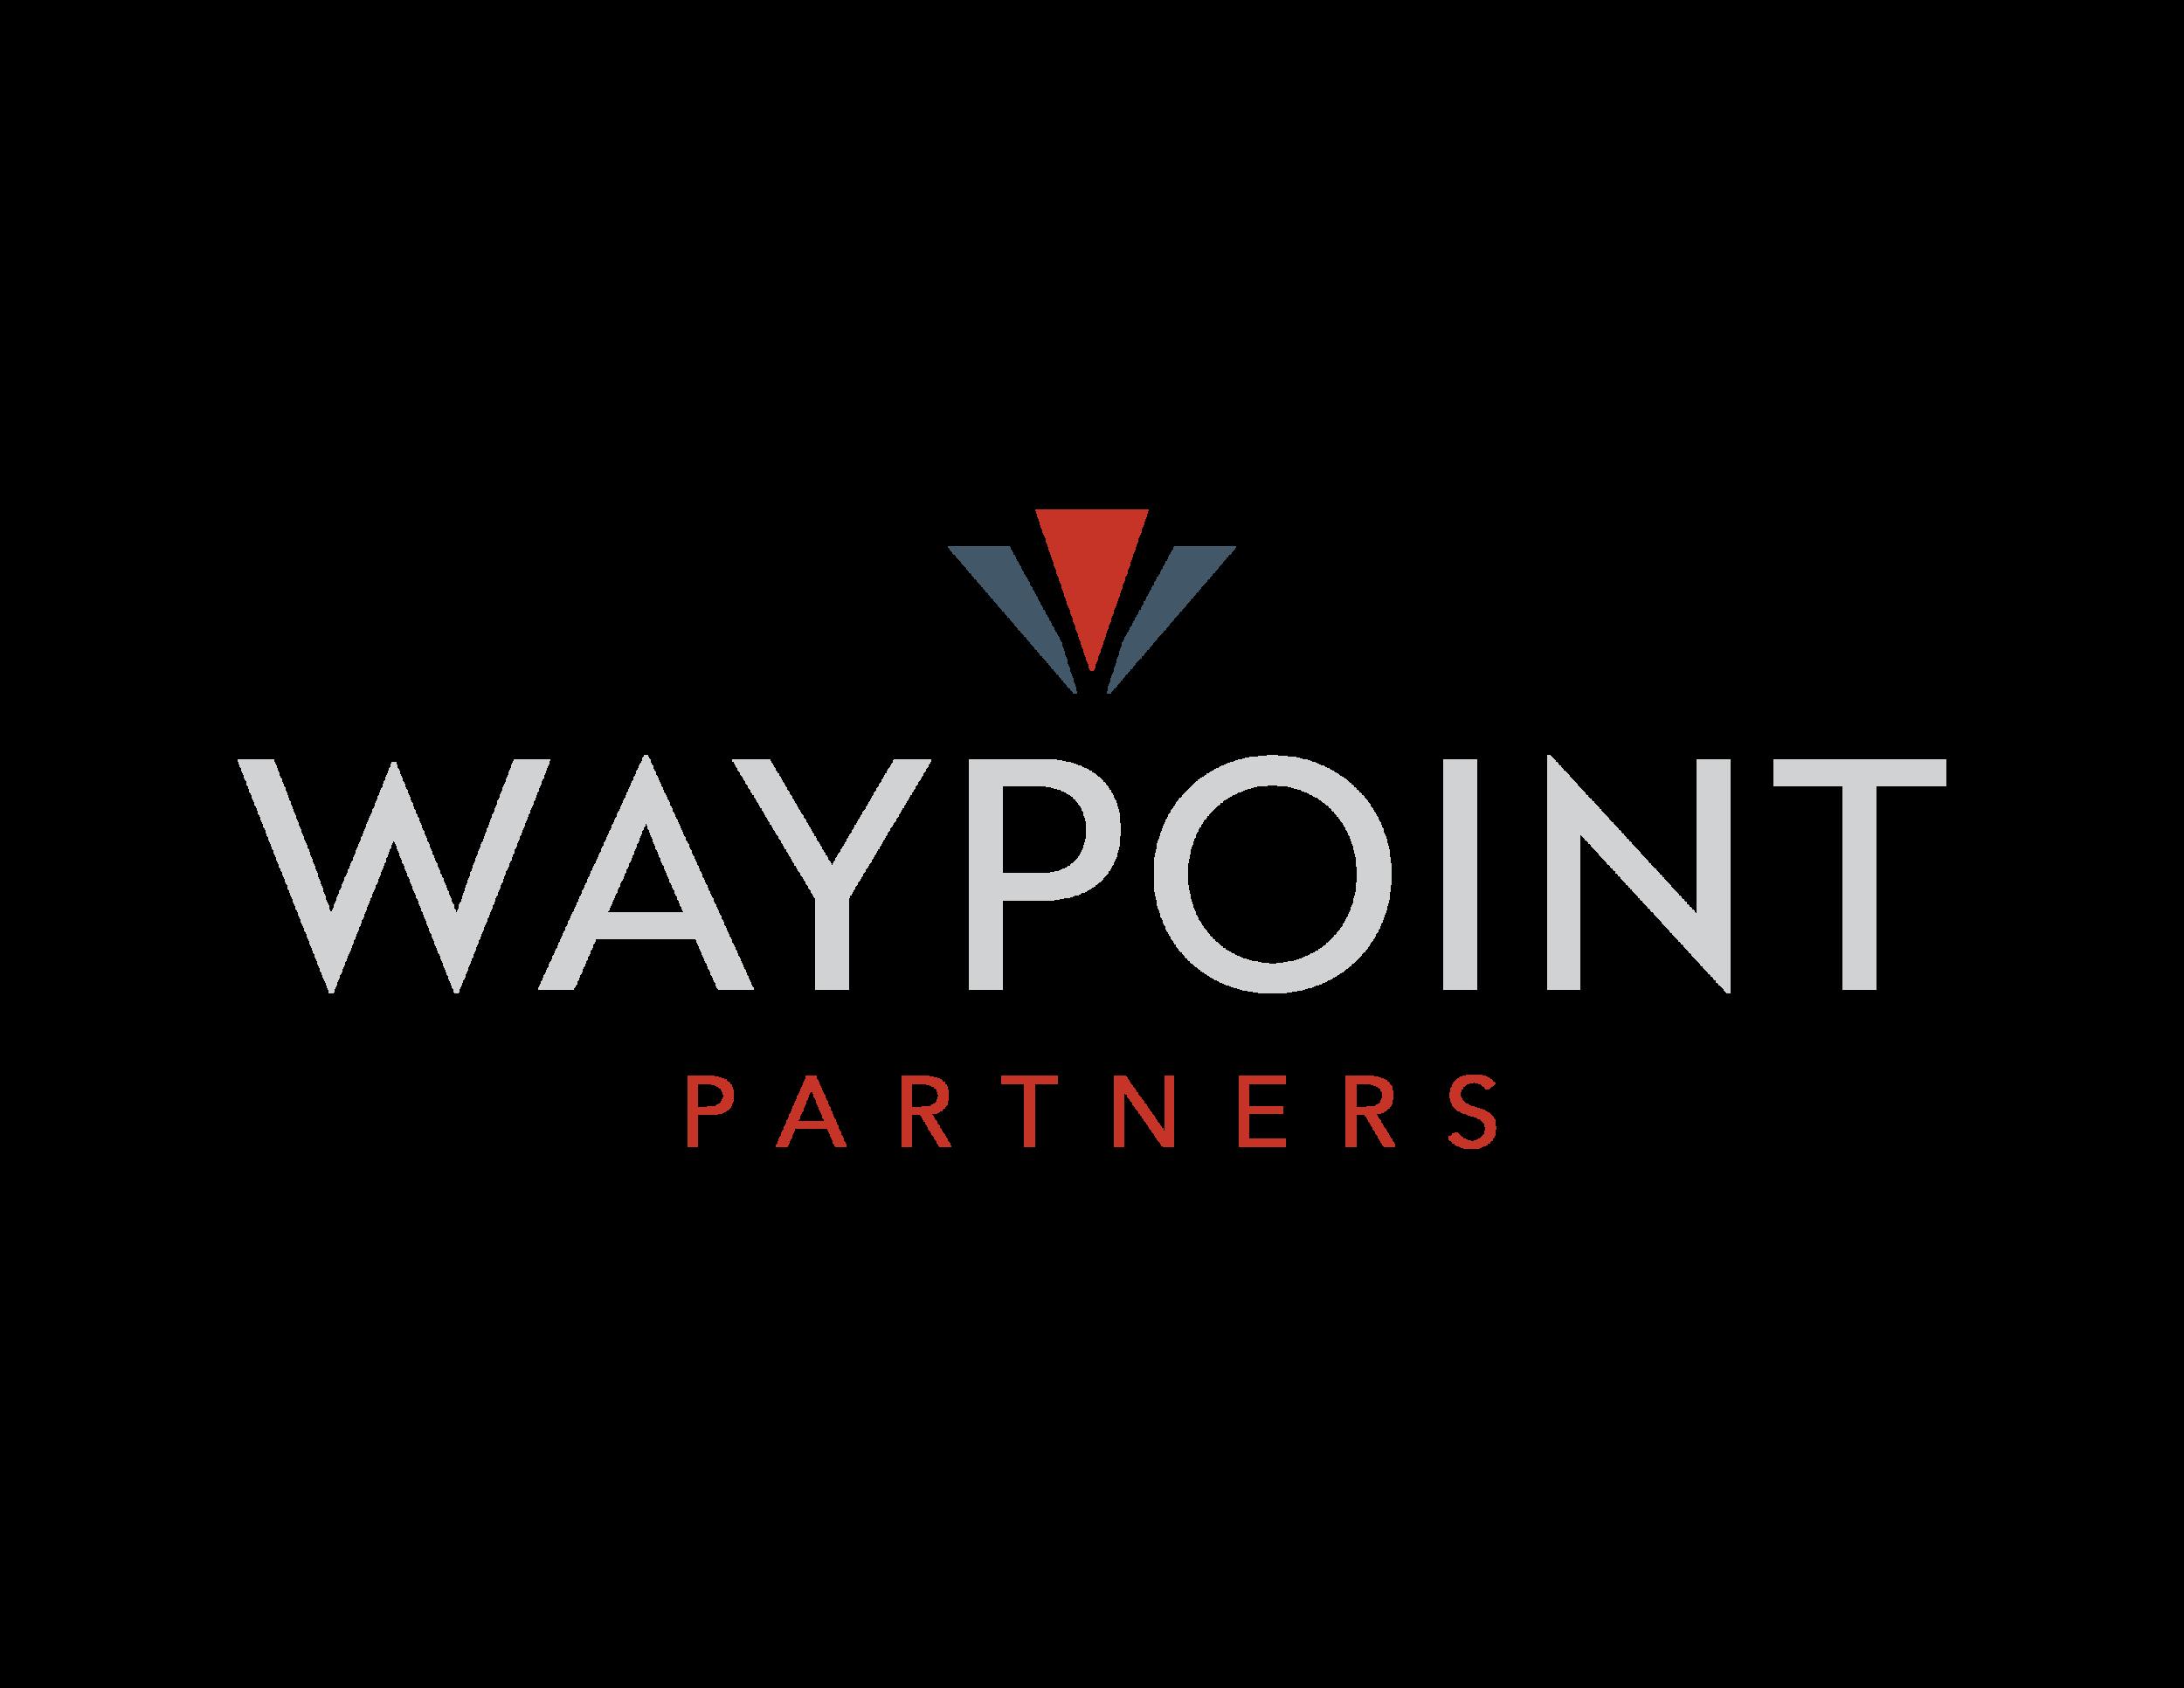 Waypoint Partners_Light Gray Logo.png